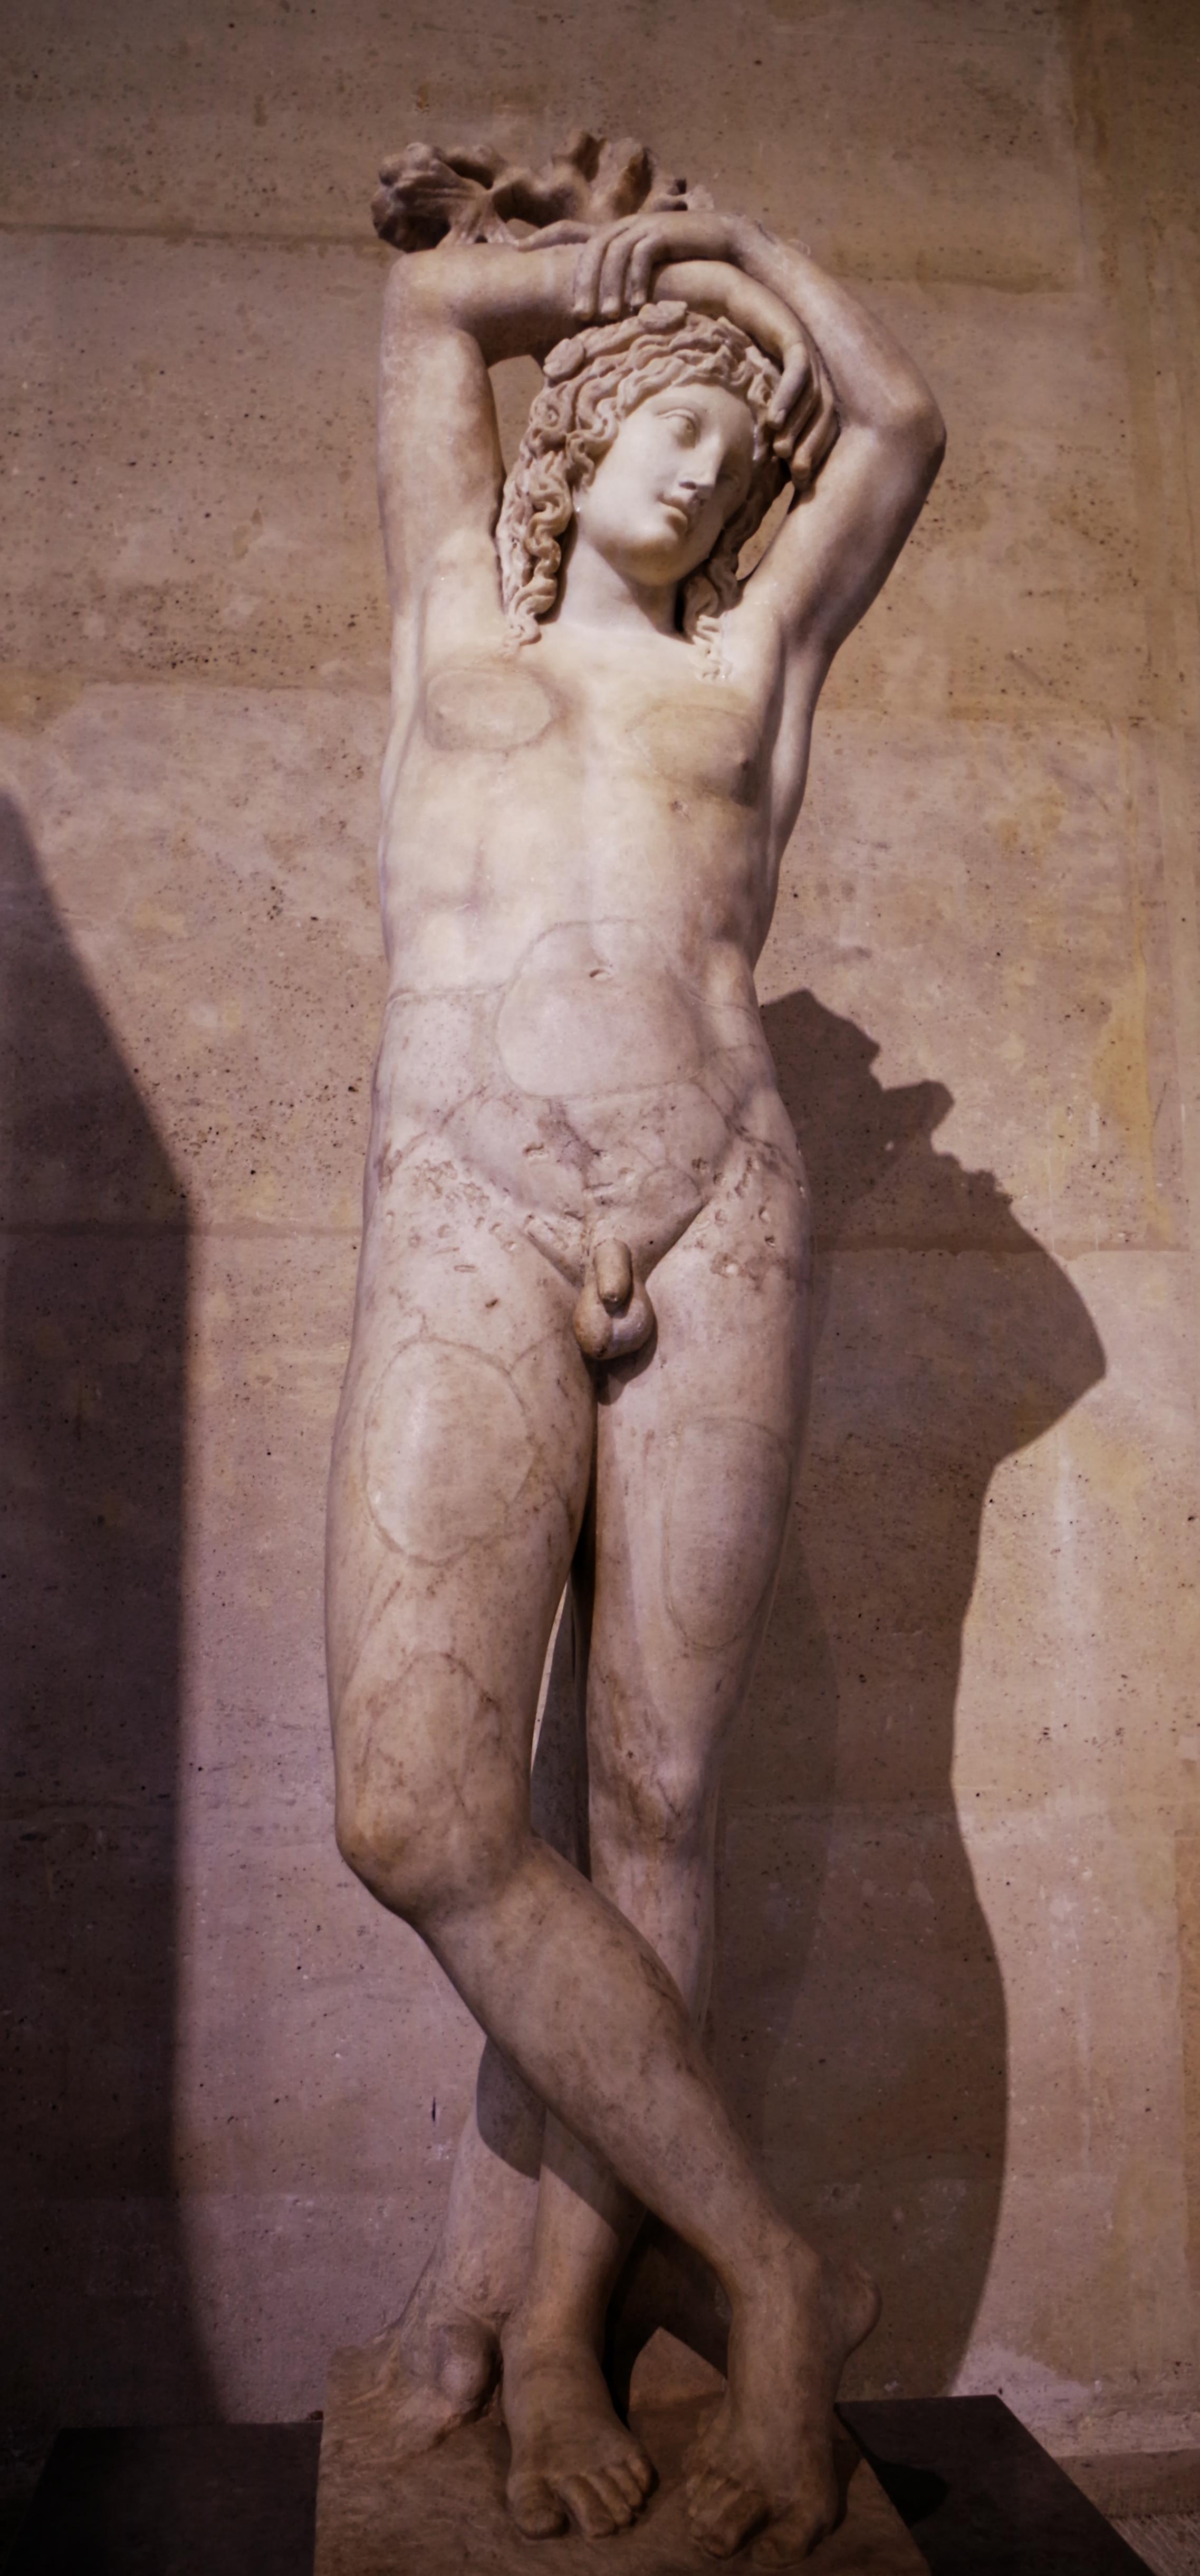 Hermaphrodite File:Narcisse - Hermaphrodite